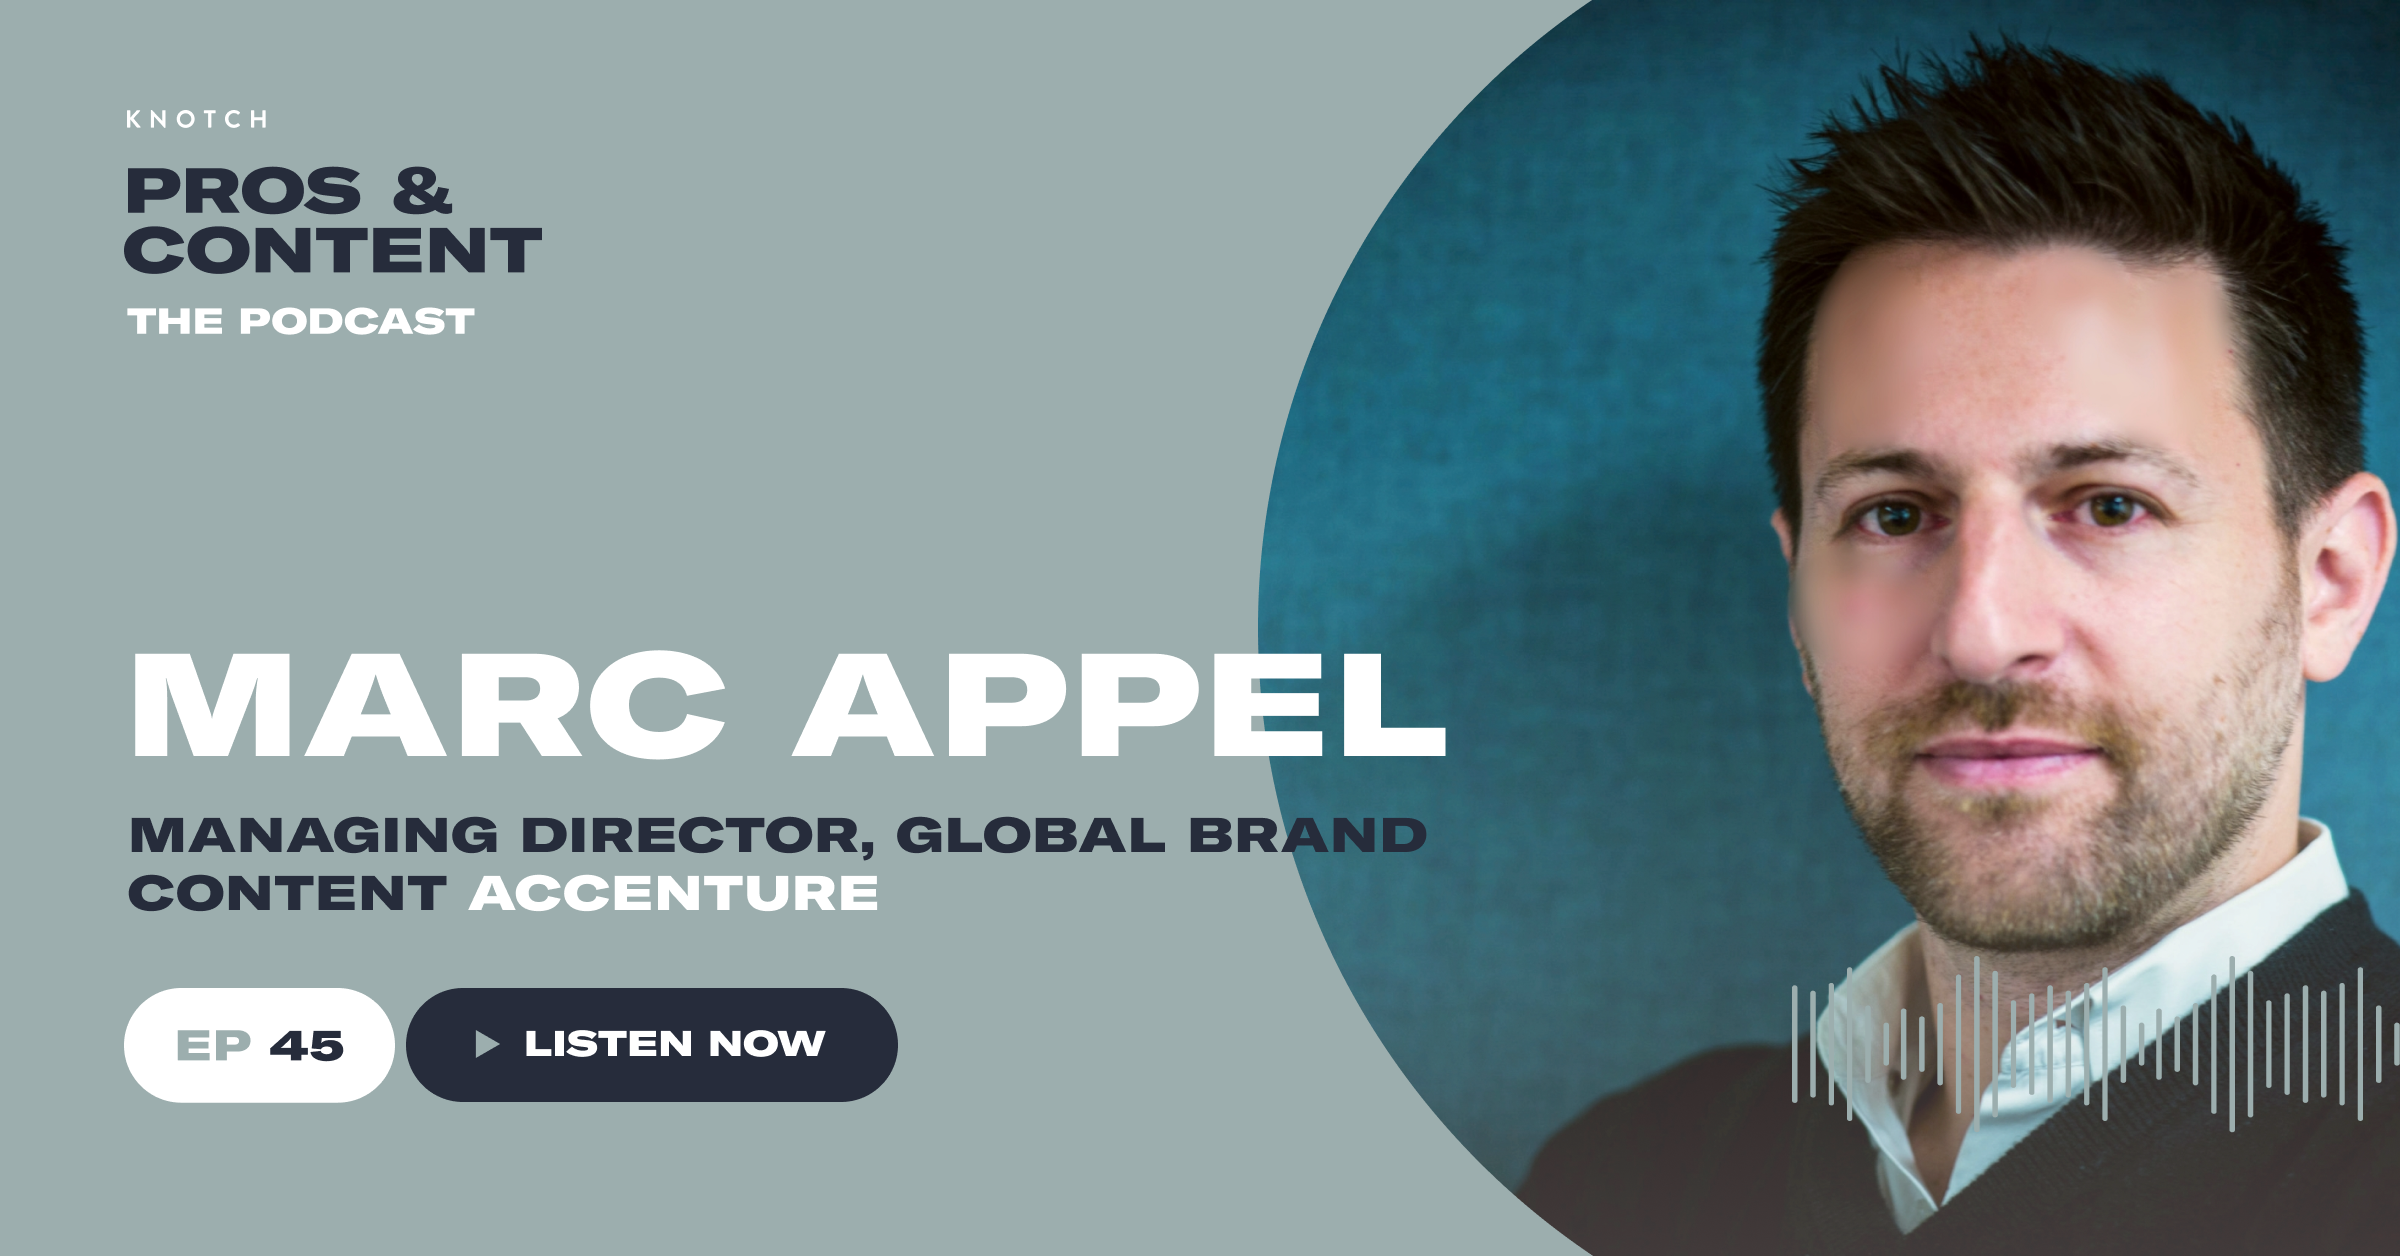 Pros & Content Podcast: Marc Appel